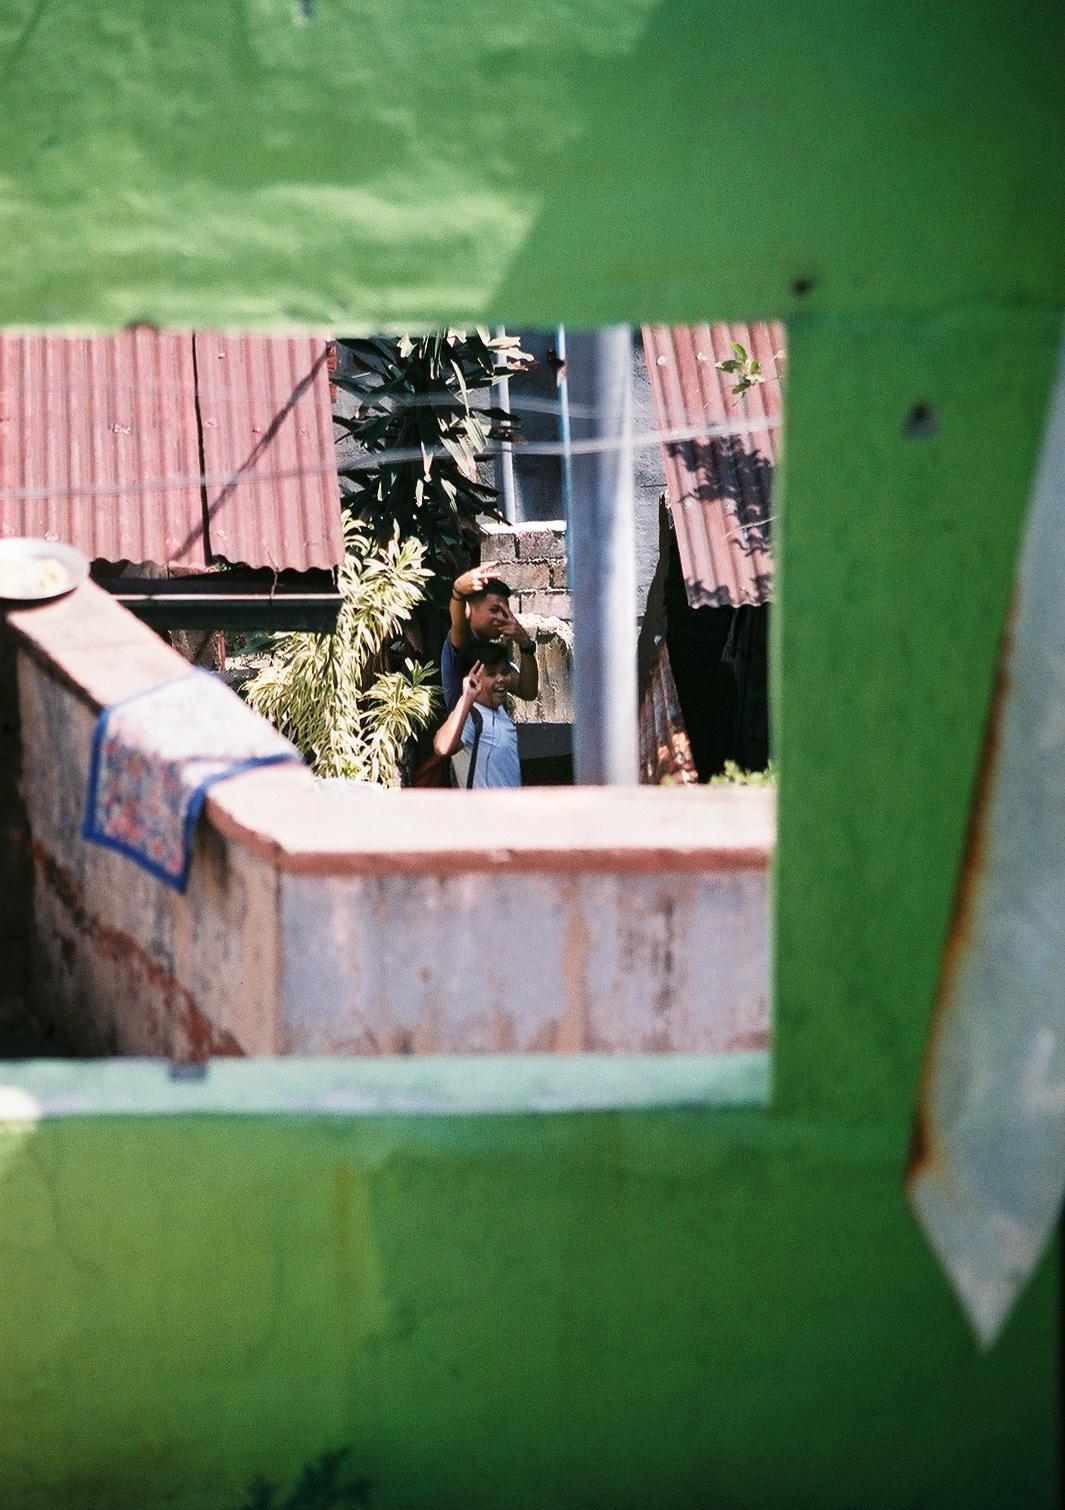 190312_Olongapo_film_BAwiga-19.jpg